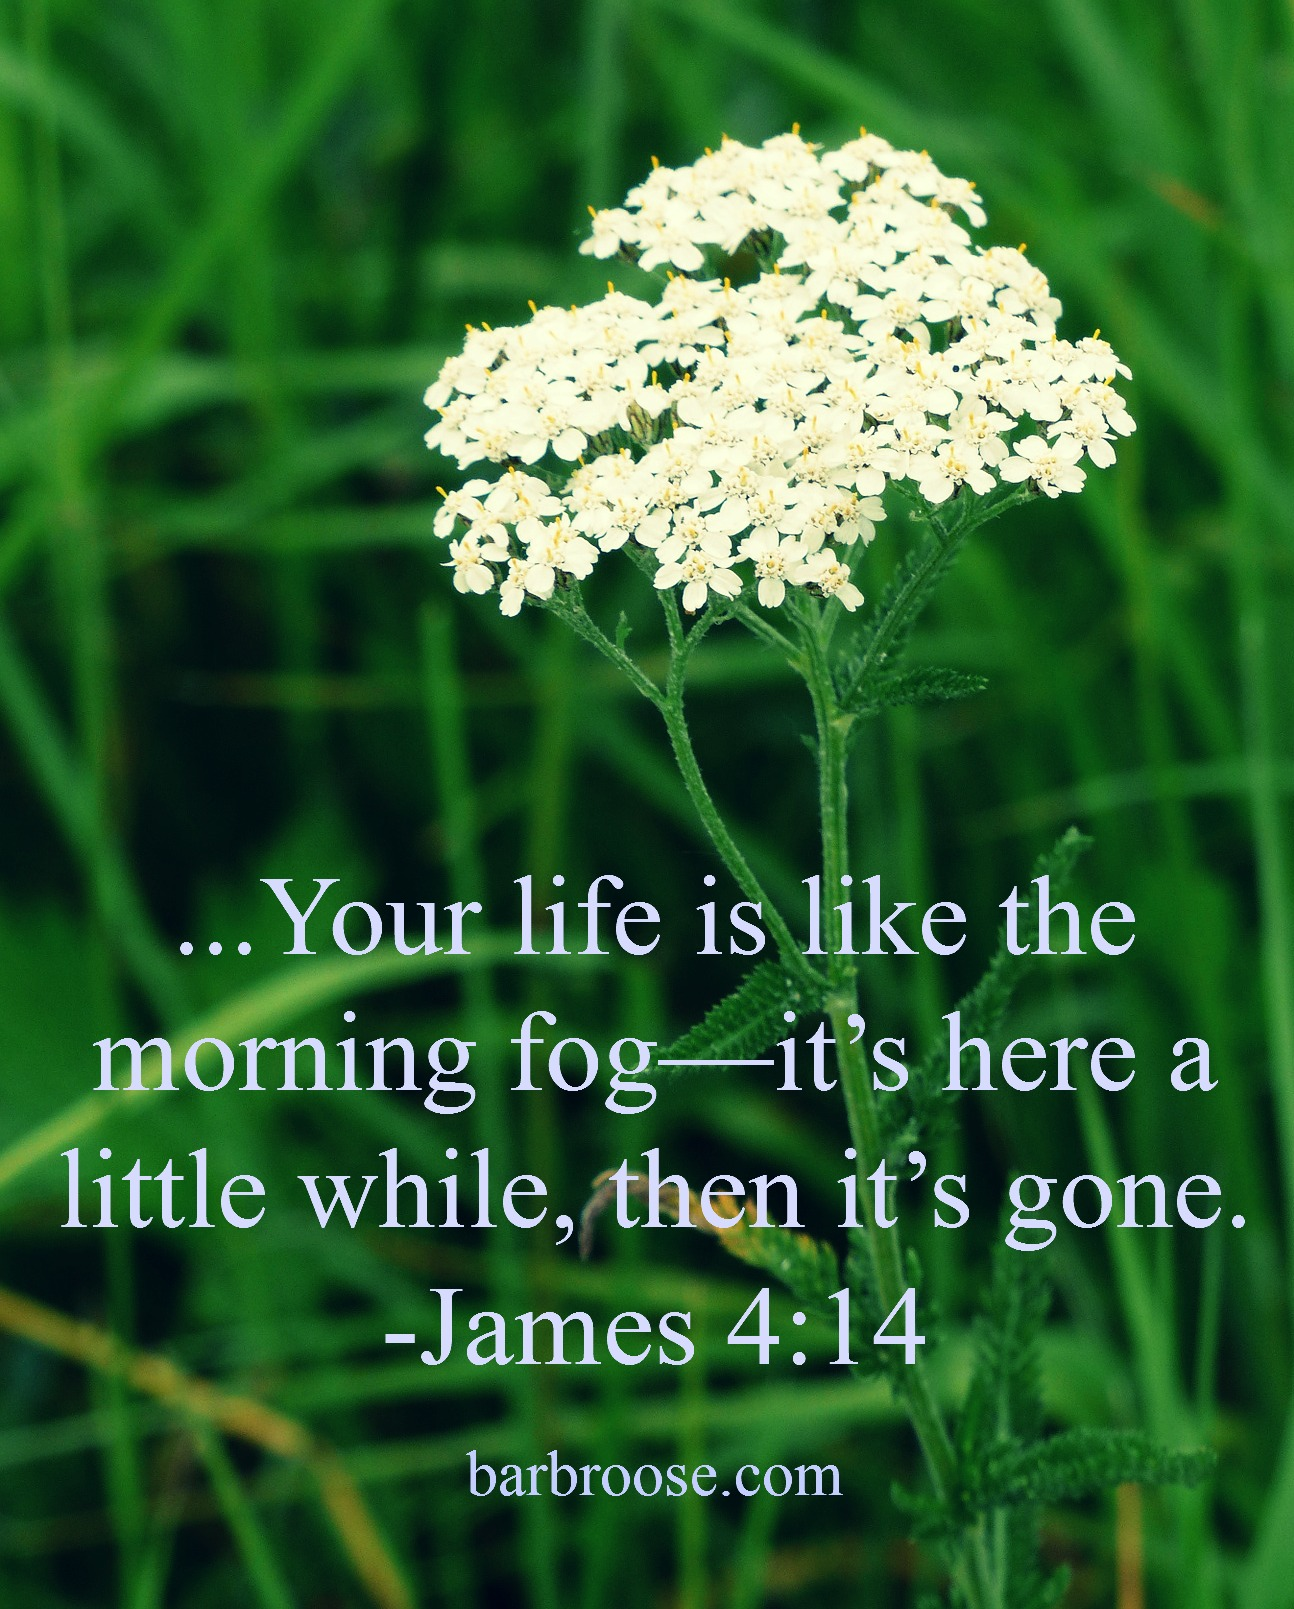 James-4.14